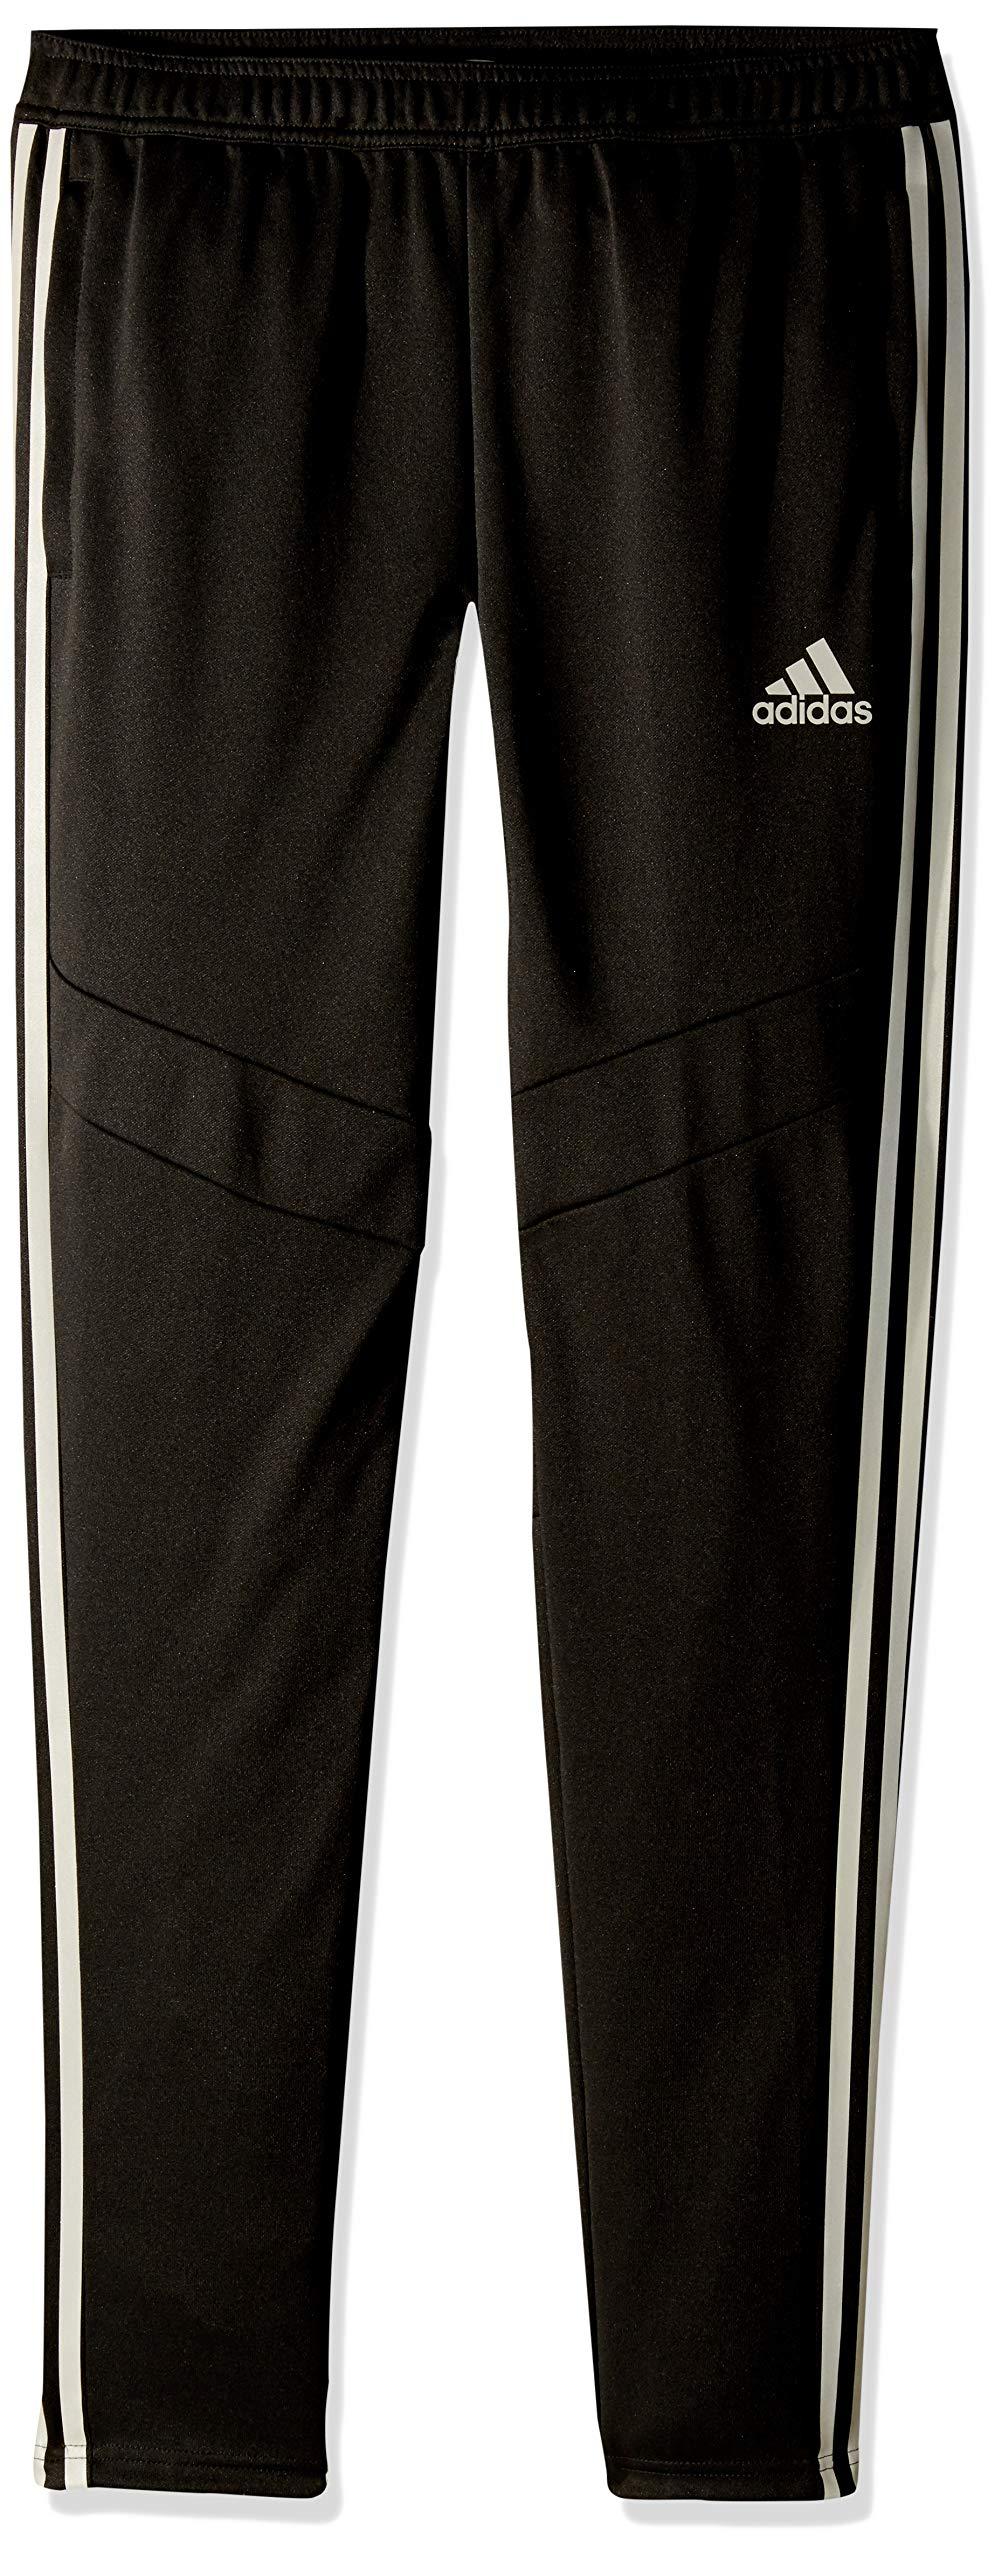 adidas Youth Soccer Tiro 19 Training Pant, Black/Reflective Silver, X-Small